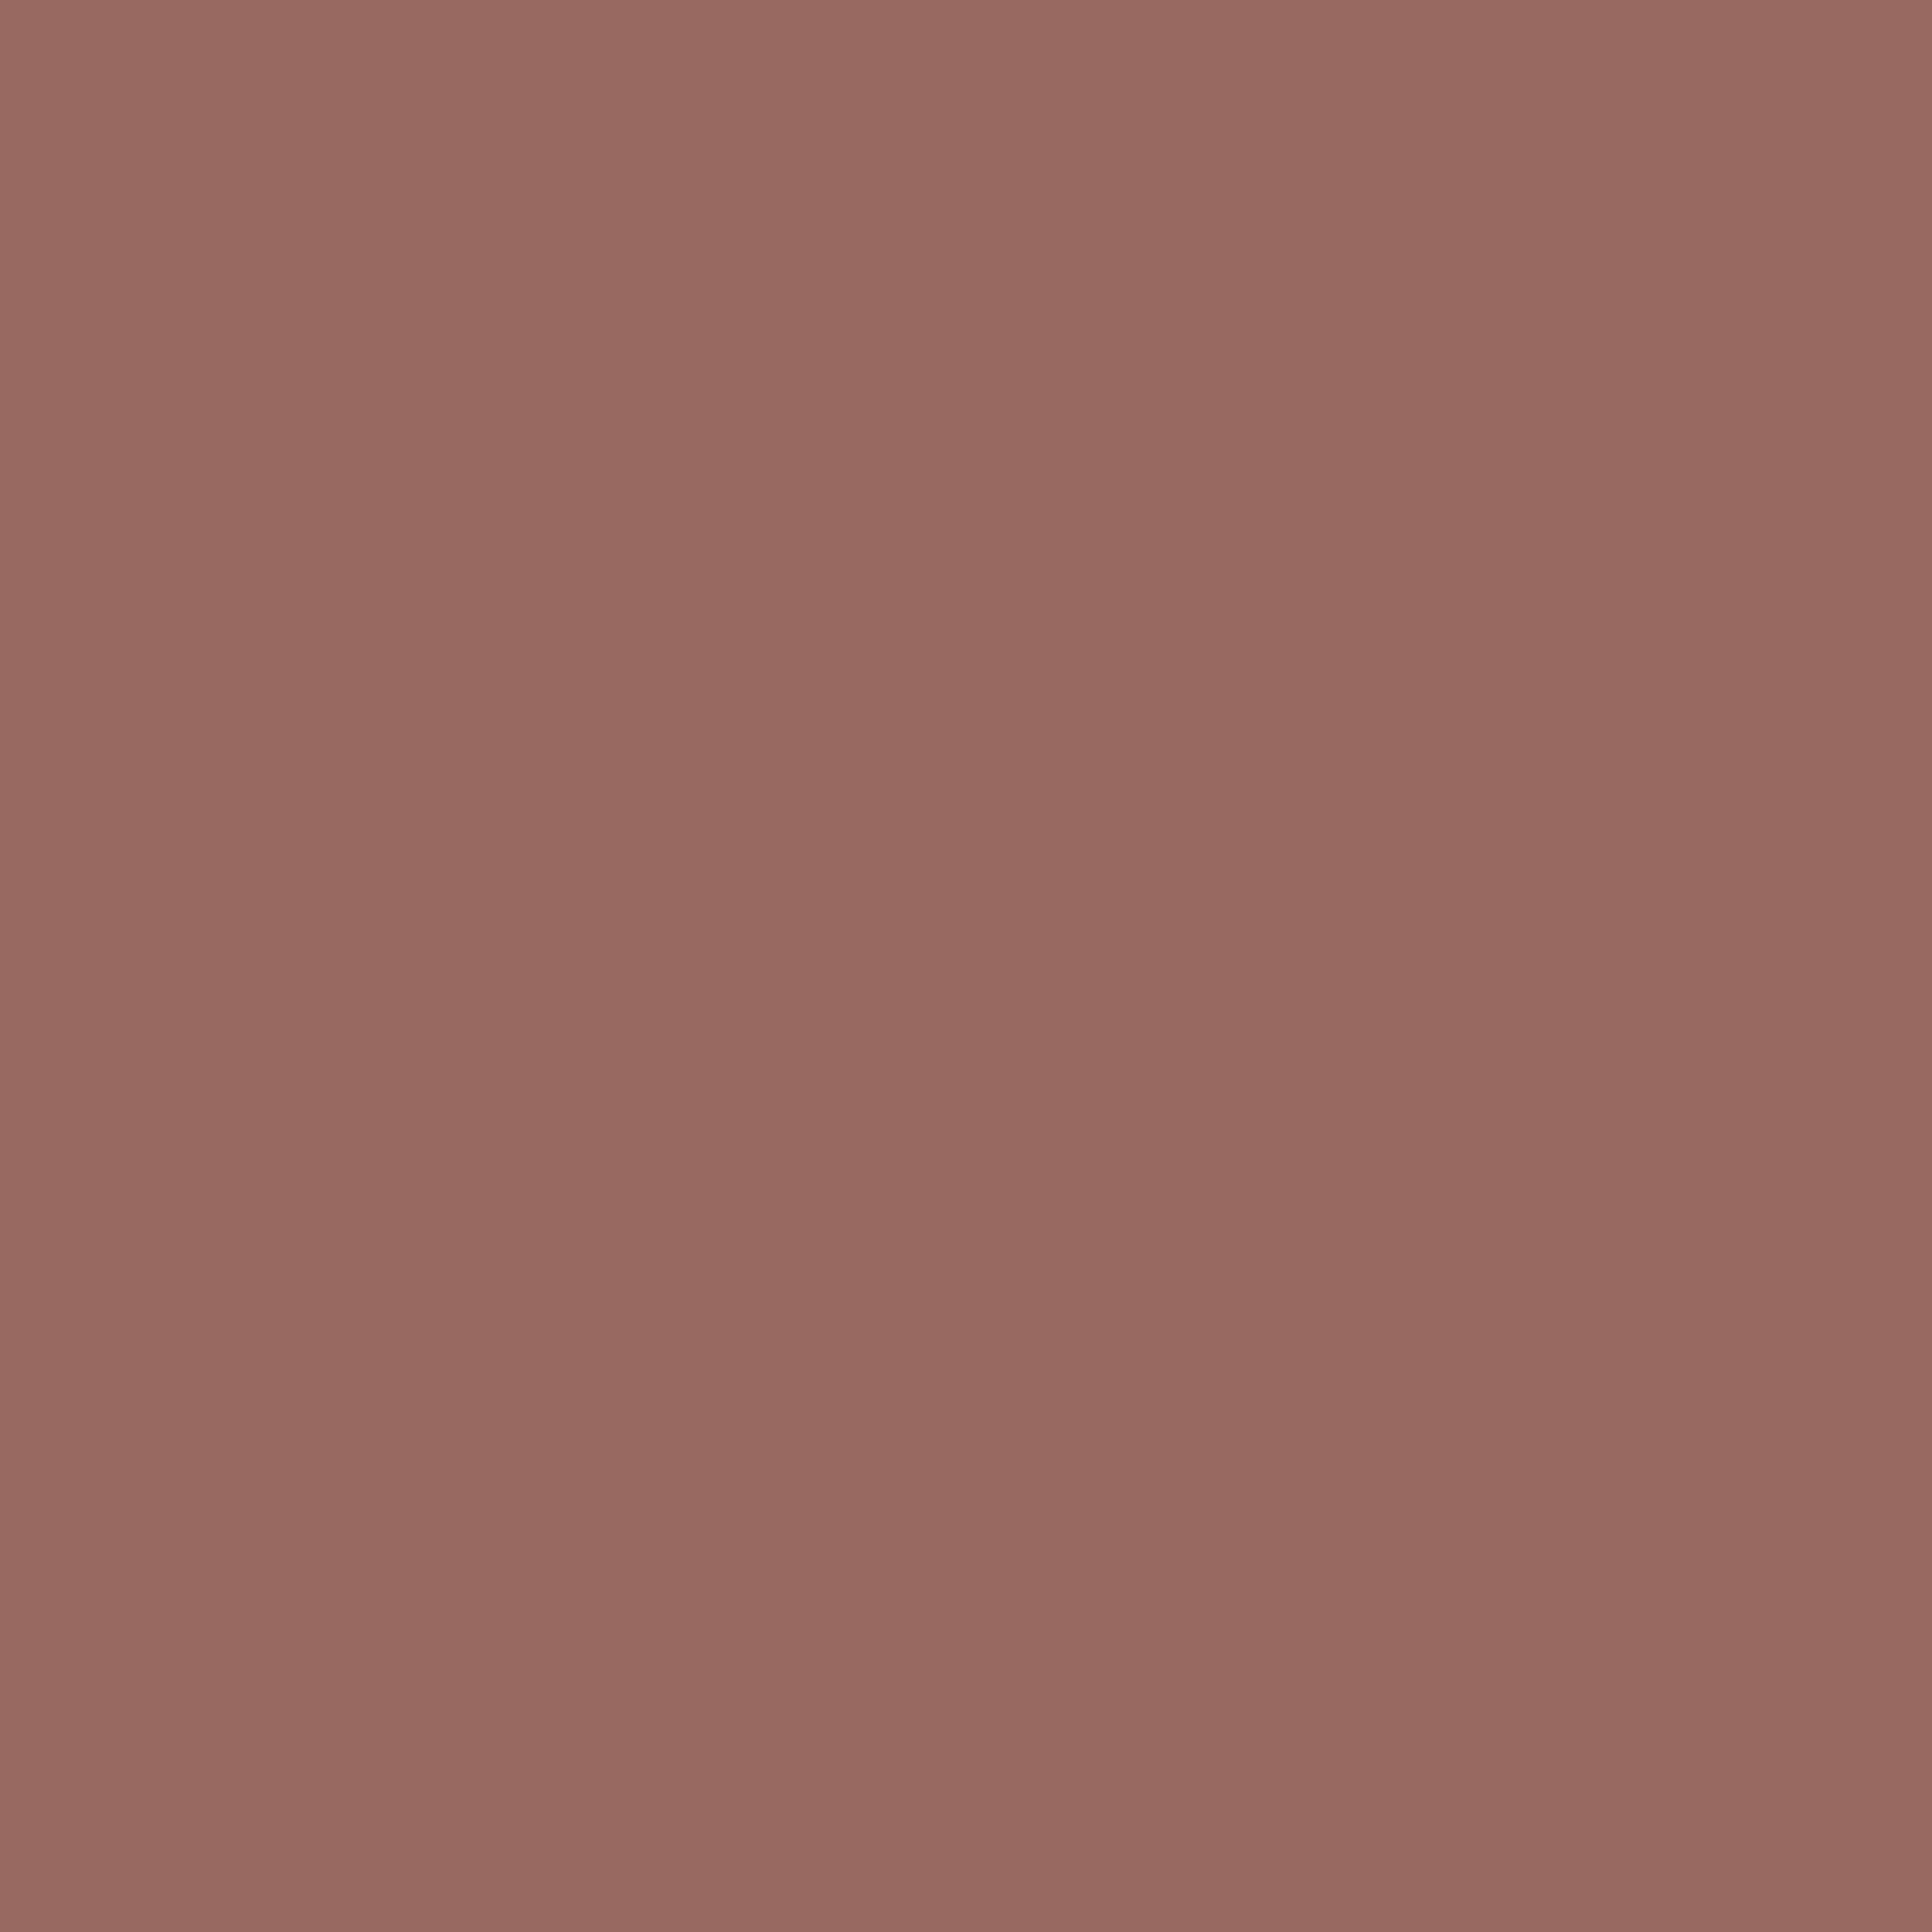 2048x2048 Dark Chestnut Solid Color Background